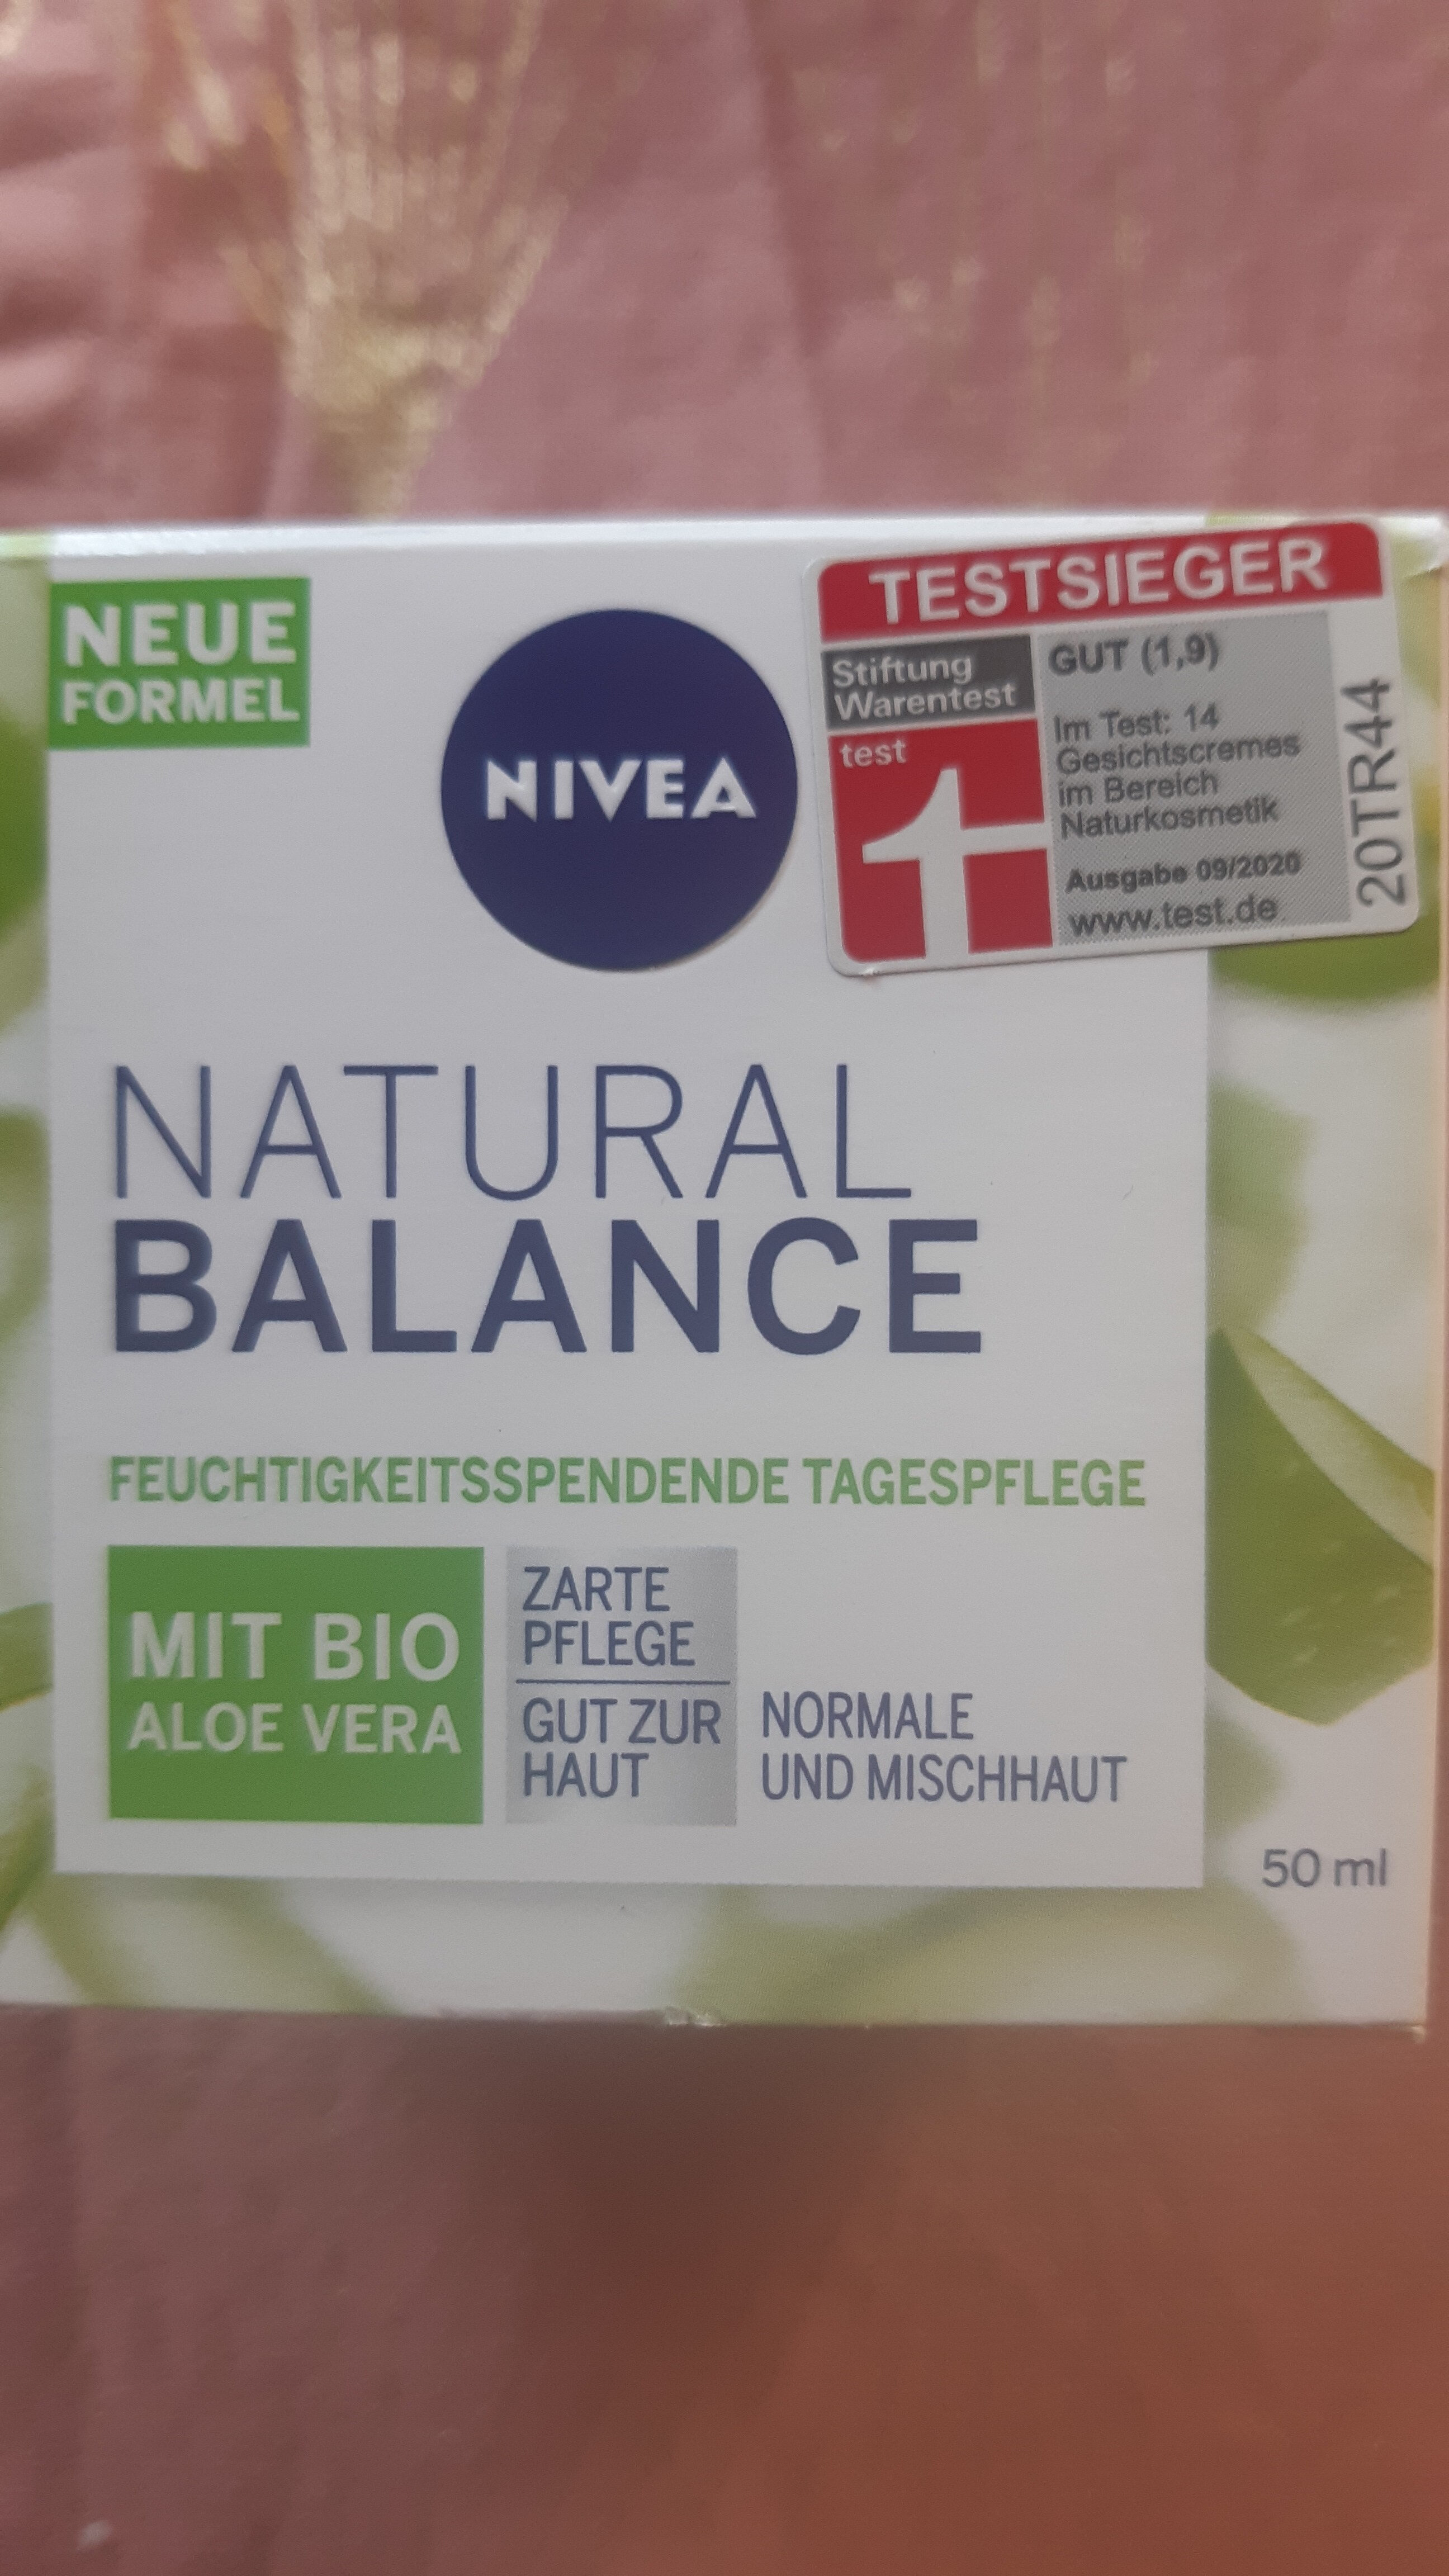 natural balance tagespflege - Product - en